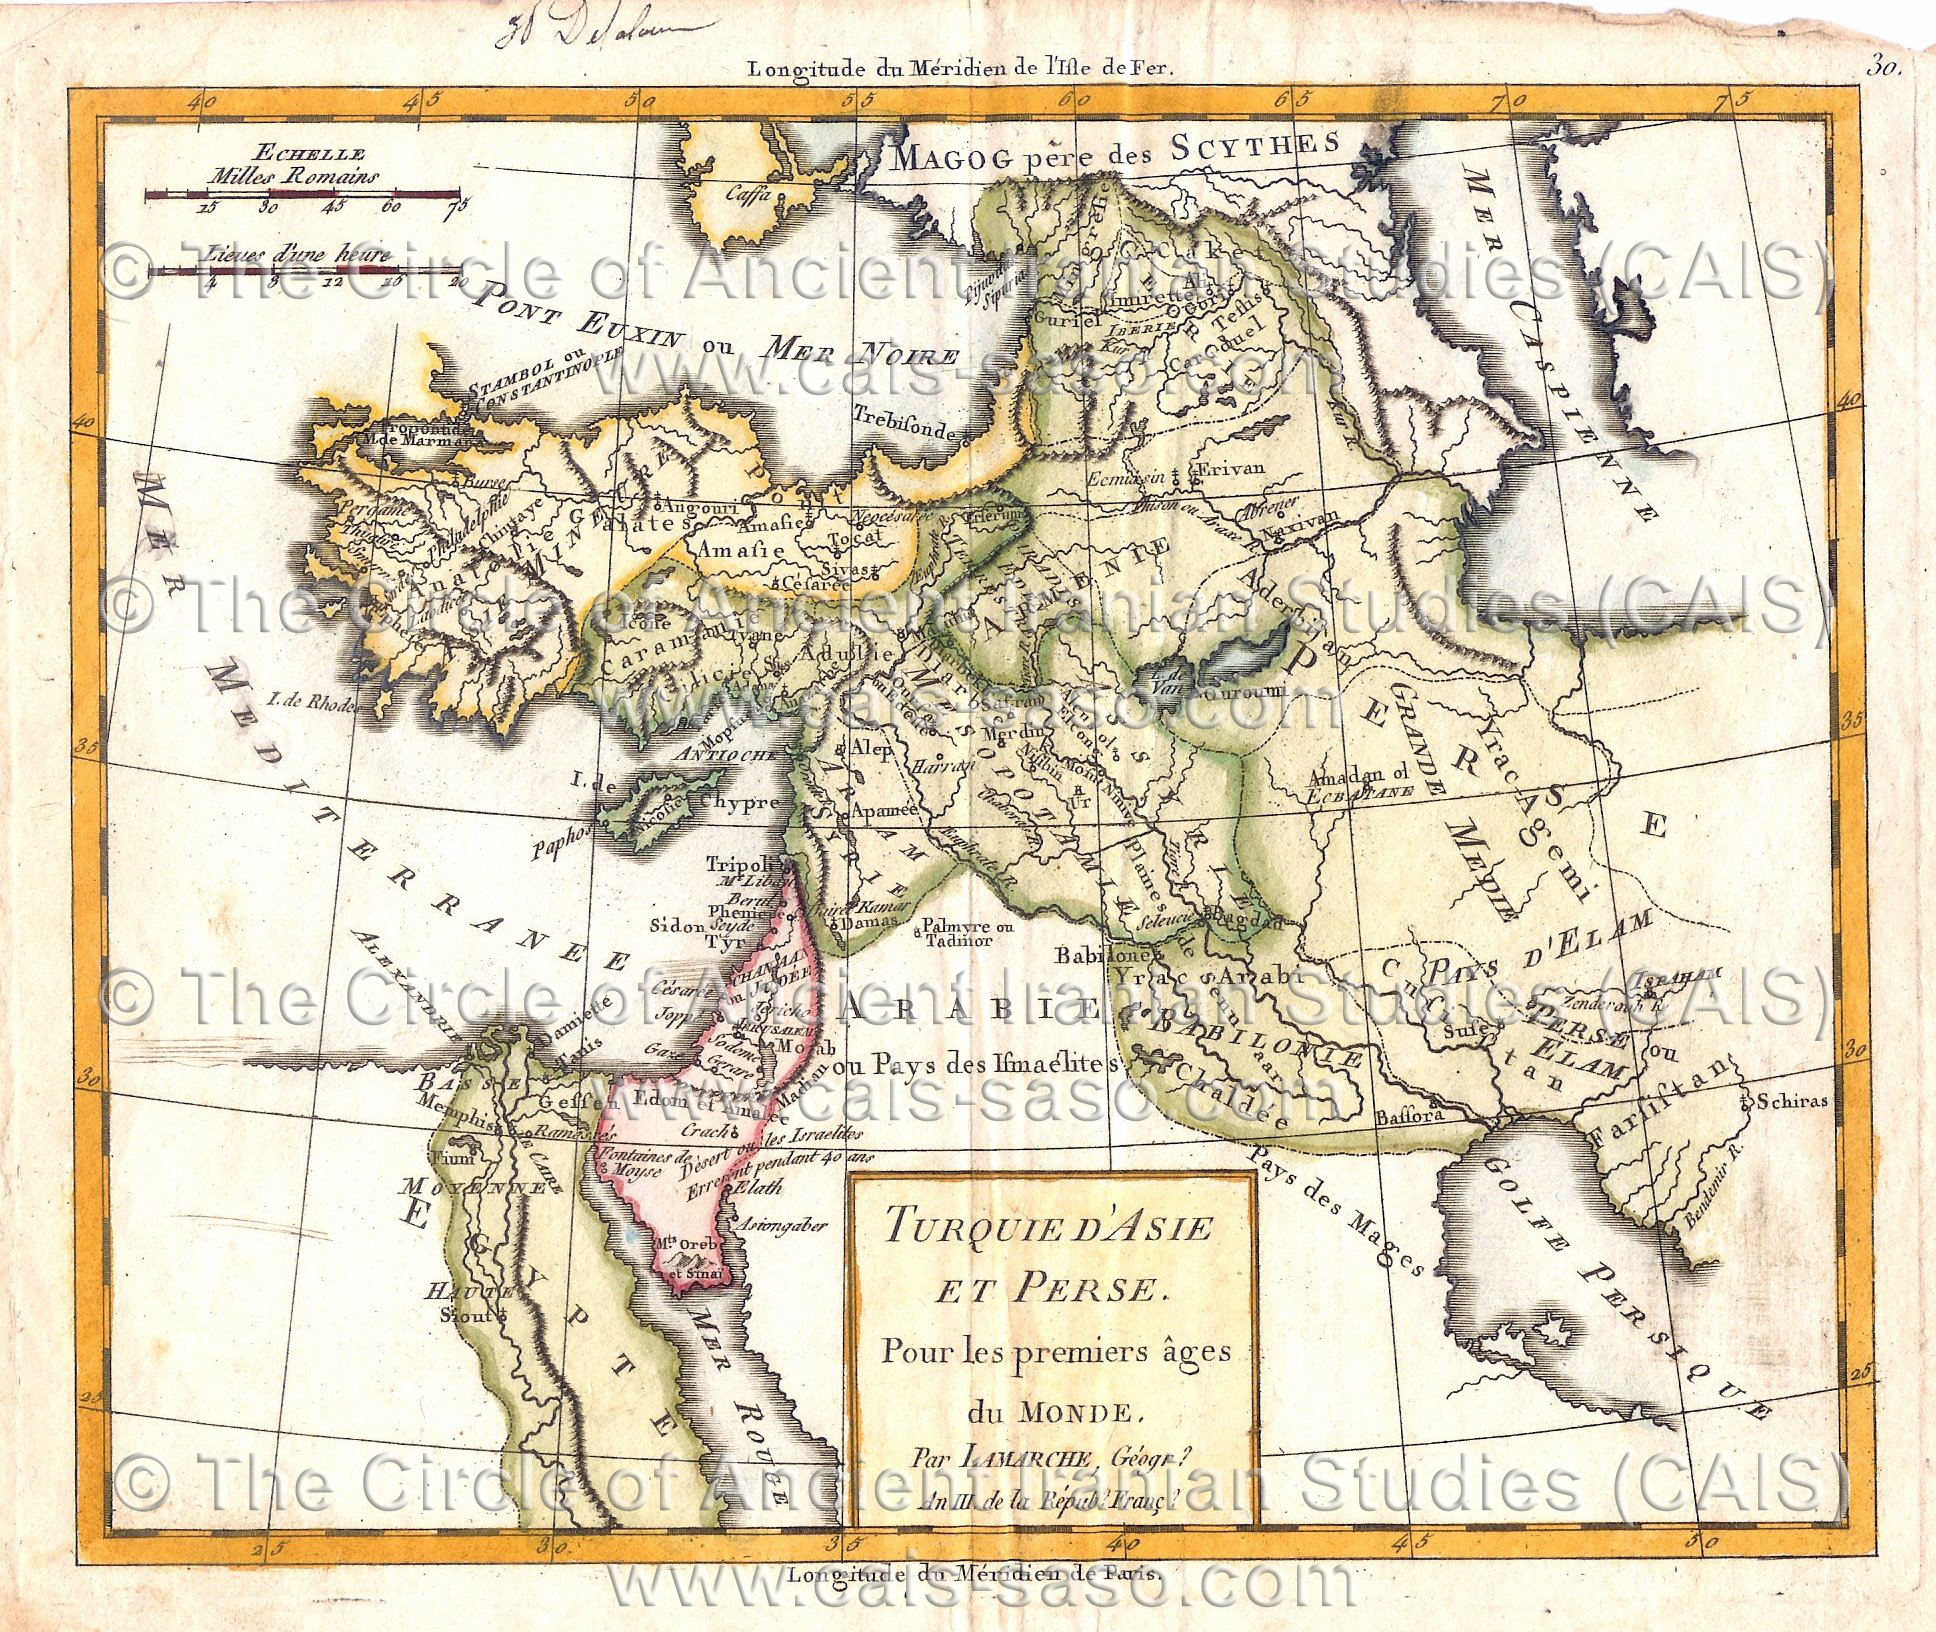 http://www.cais-soas.com/CAIS/Images2/persian_gulf/Tuquie_dAsie_et_Perse_Turkey__Persia_1795WM.png